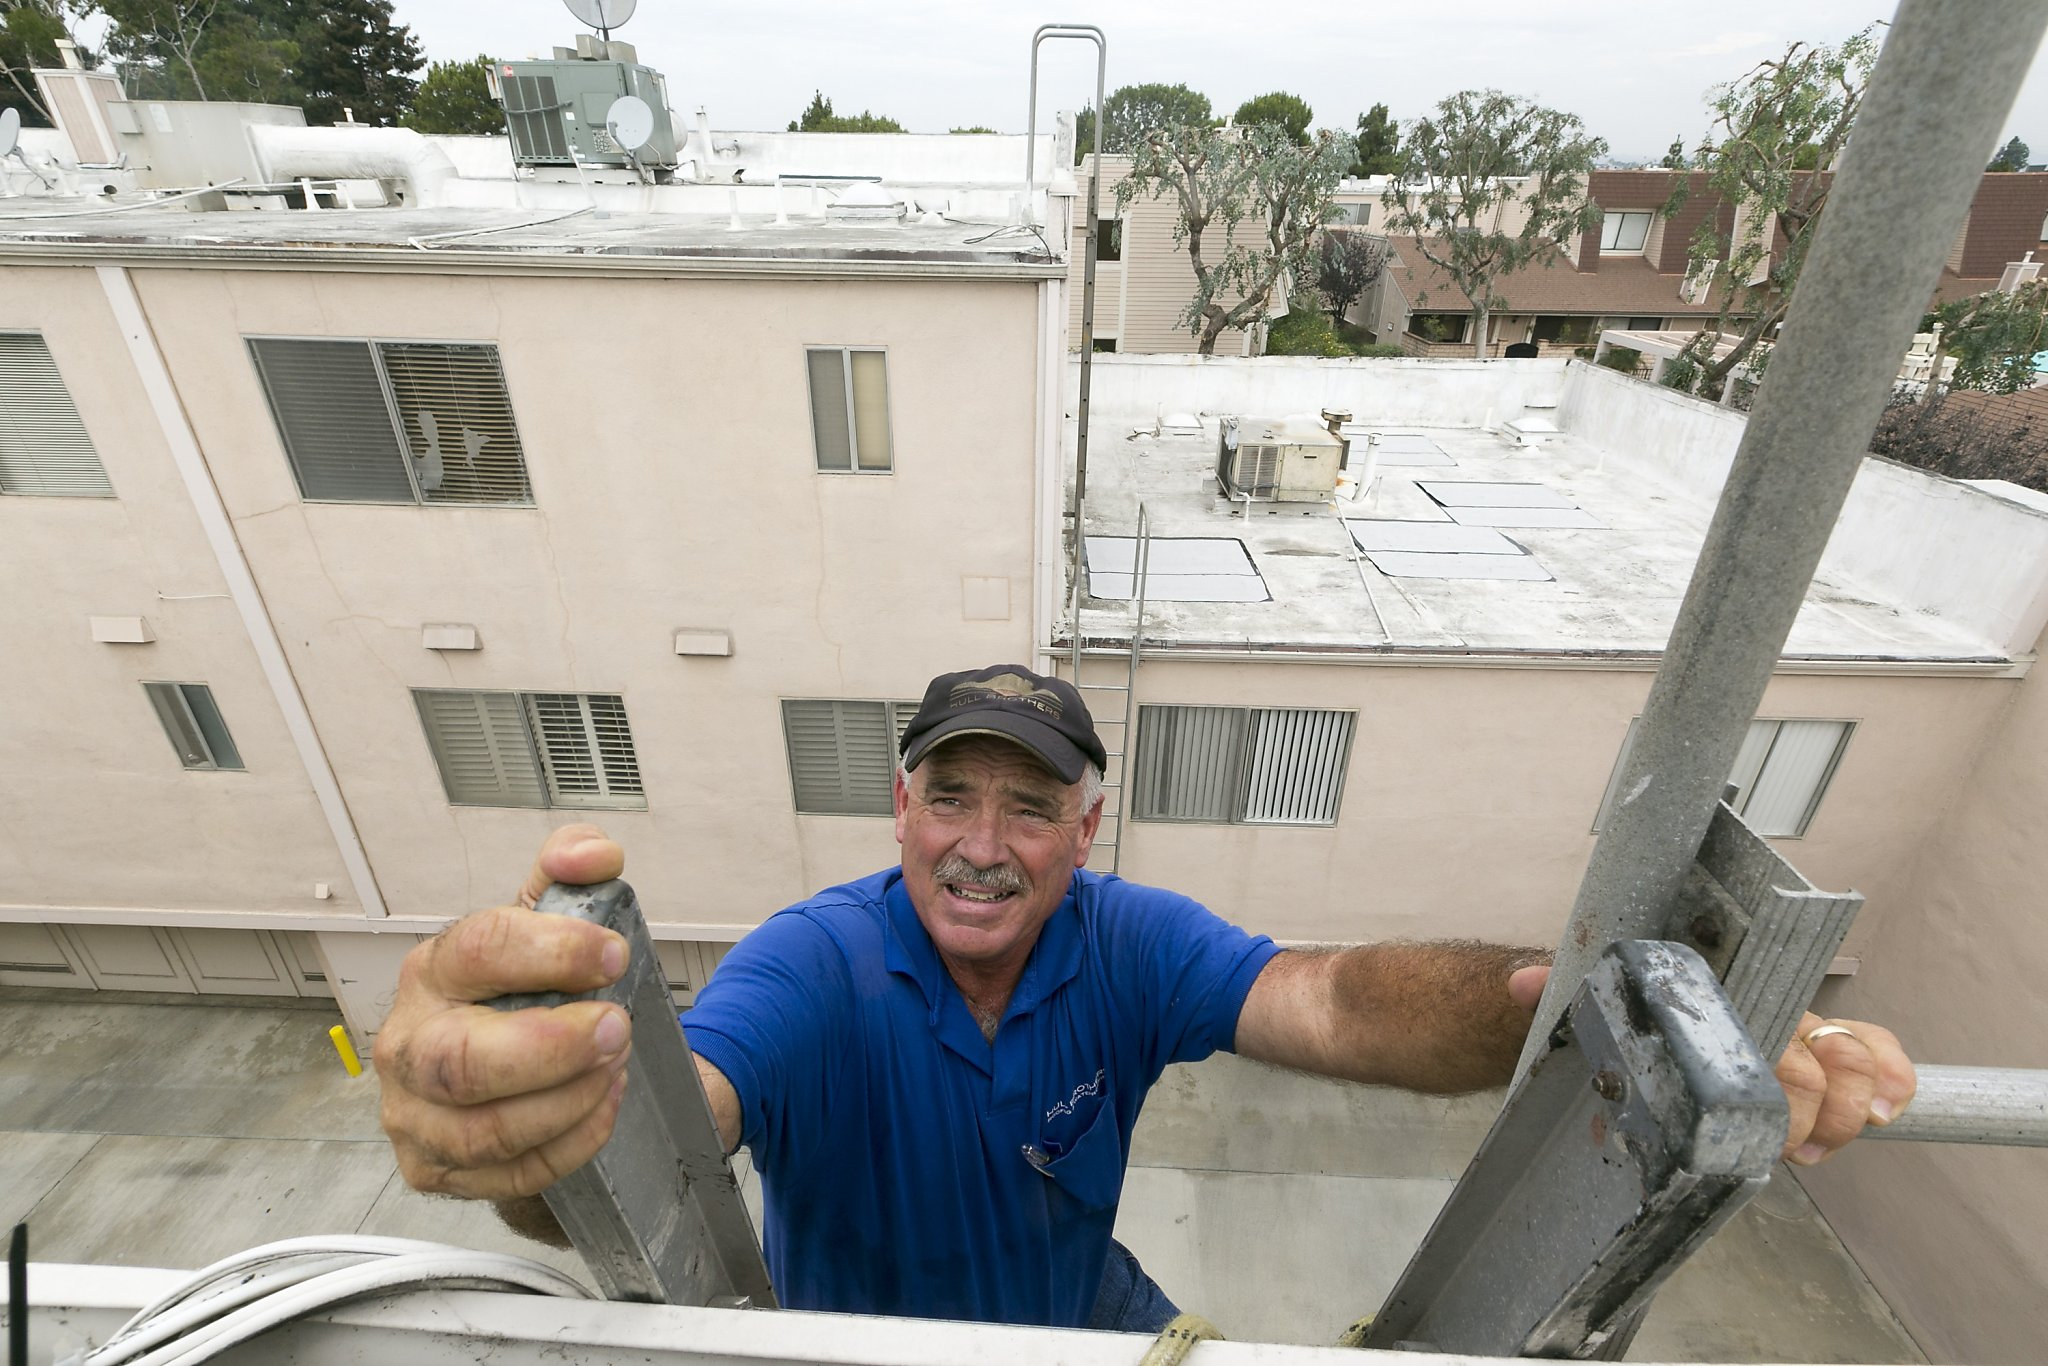 sc 1 st  SFGate & Drought-plagued California readies for El Niño storms - SFGate memphite.com